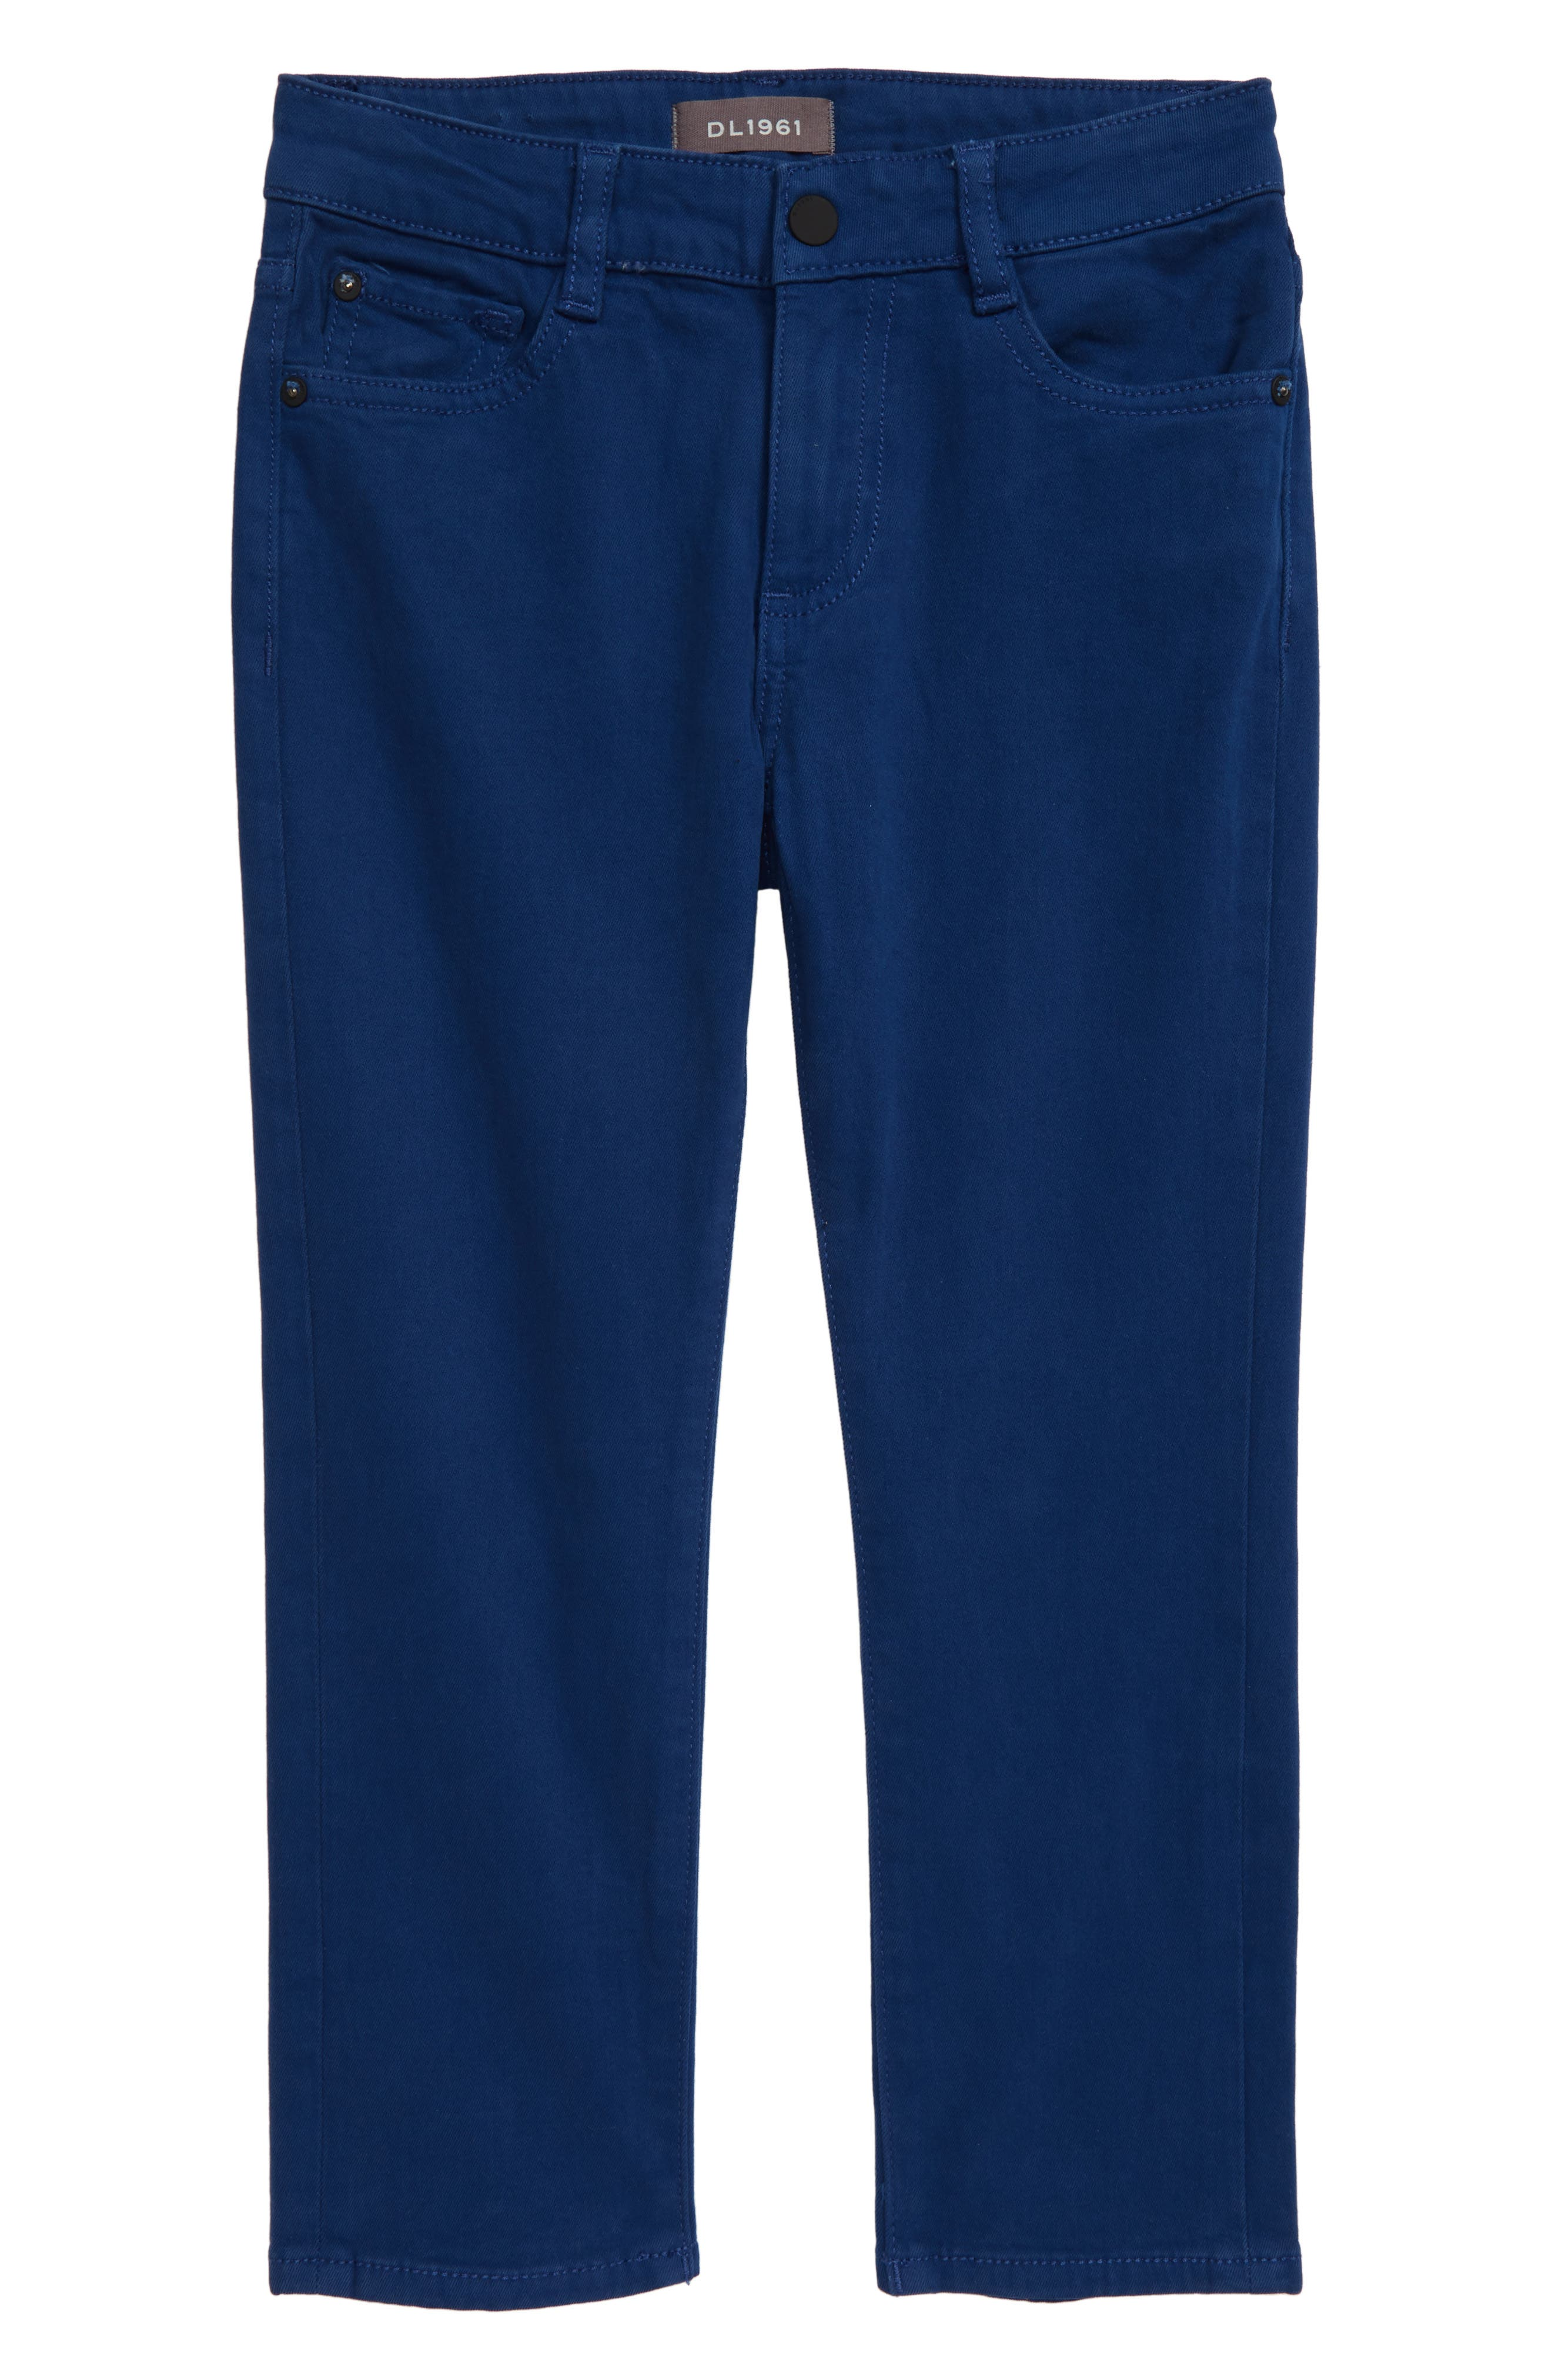 Boys Dl1961 Brady Slim Fit Jeans Size 6  Blue